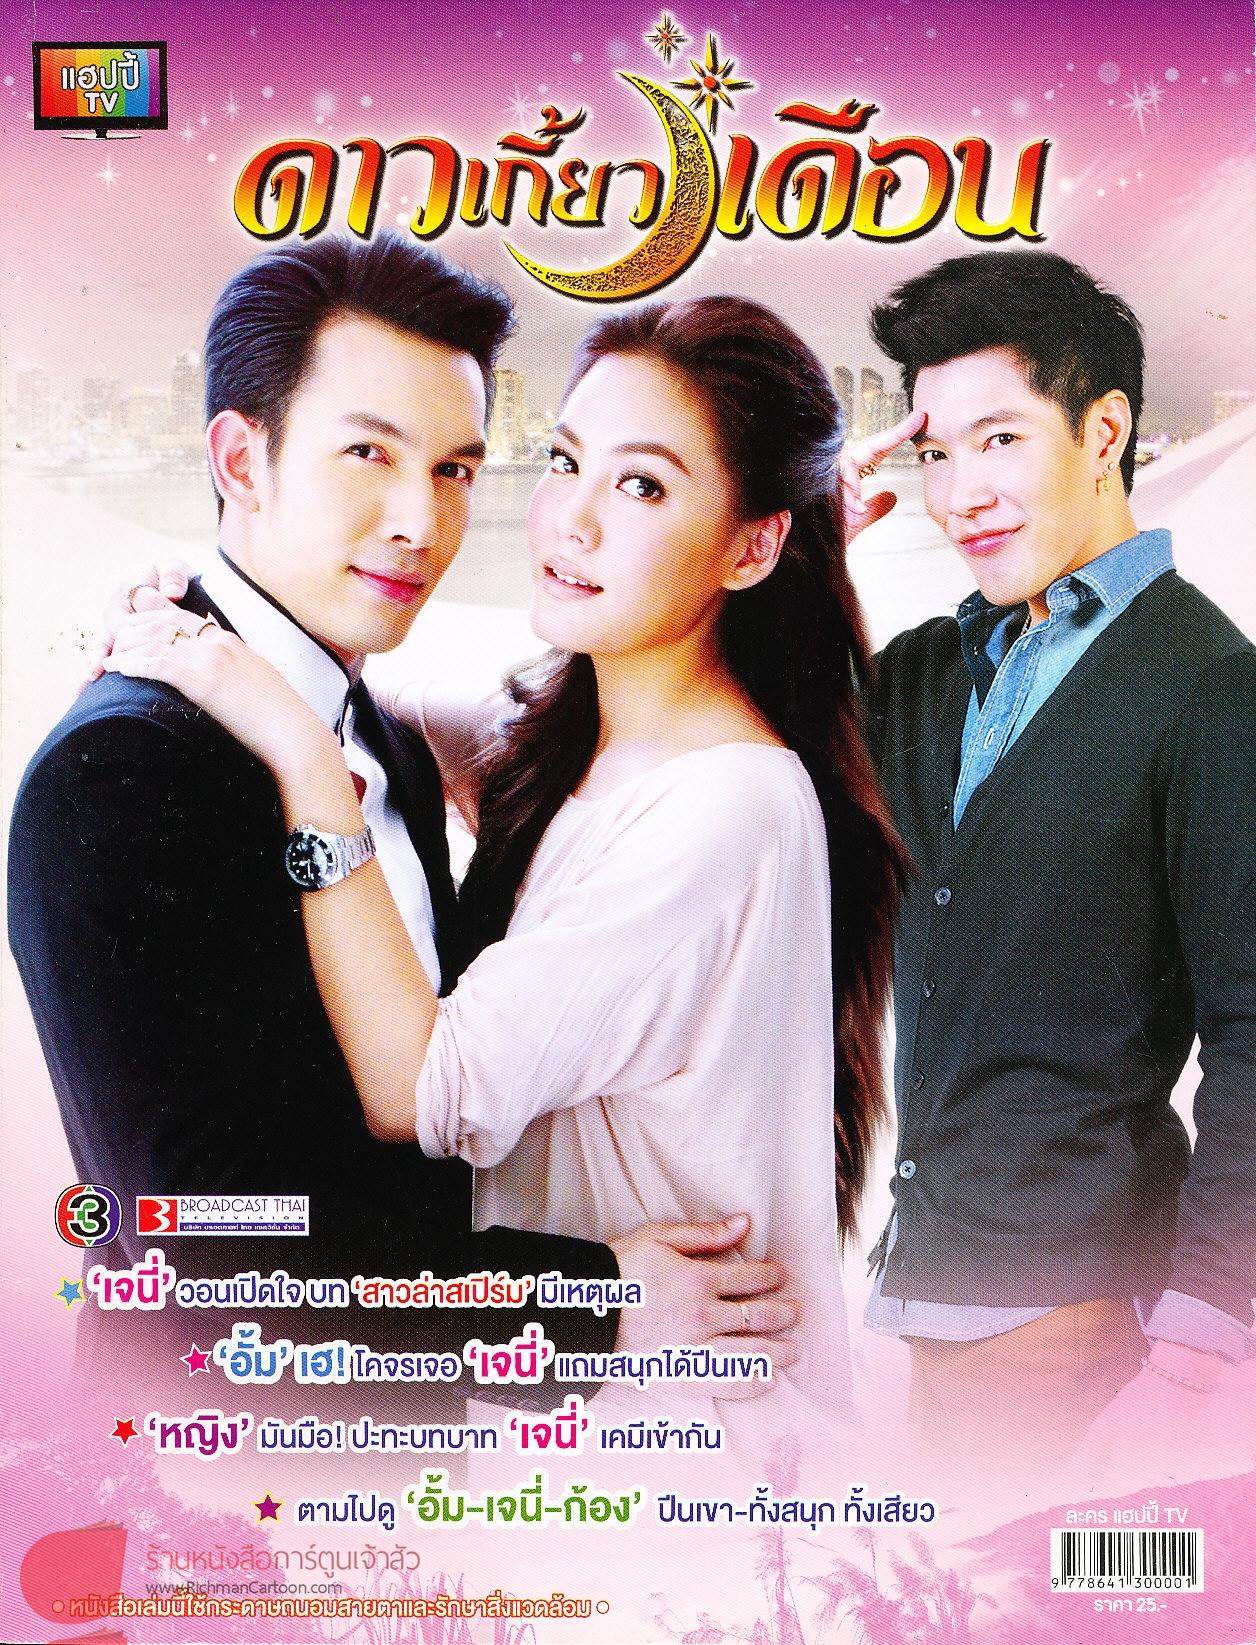 Dao Kiao Duen (2013) / The Star Courts the Moon